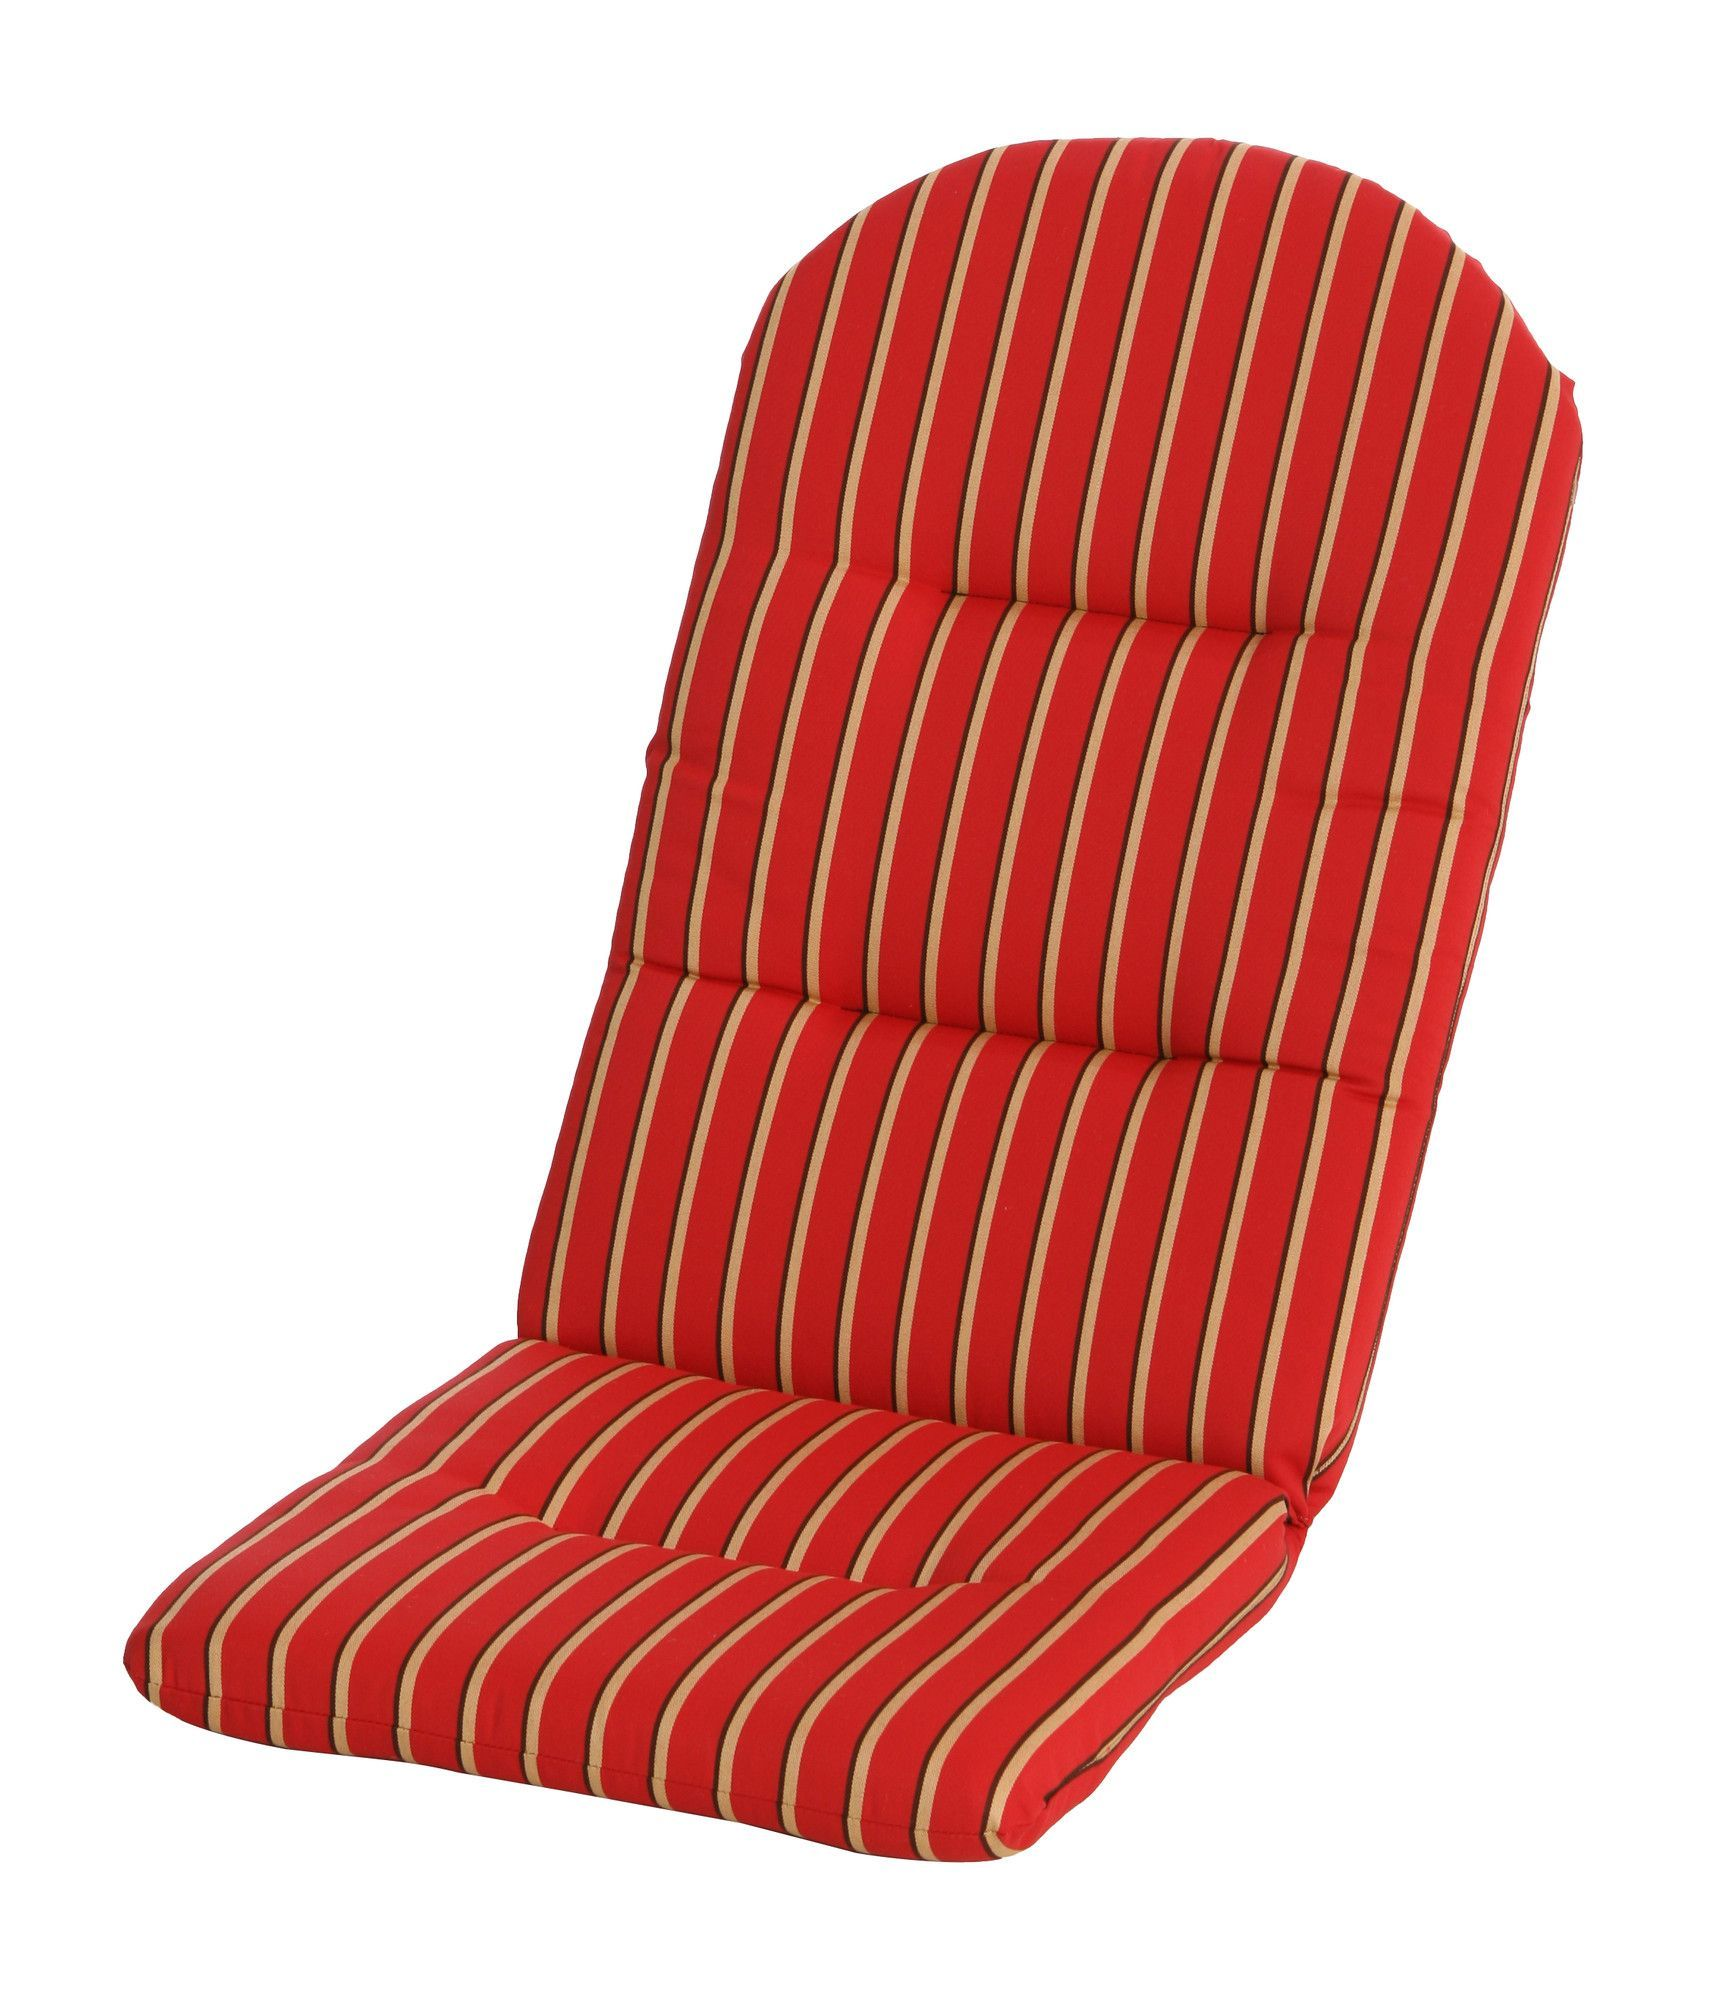 Phat Tommy Outdoor Sunbrella Adirondack Chair Cushion Adirondack